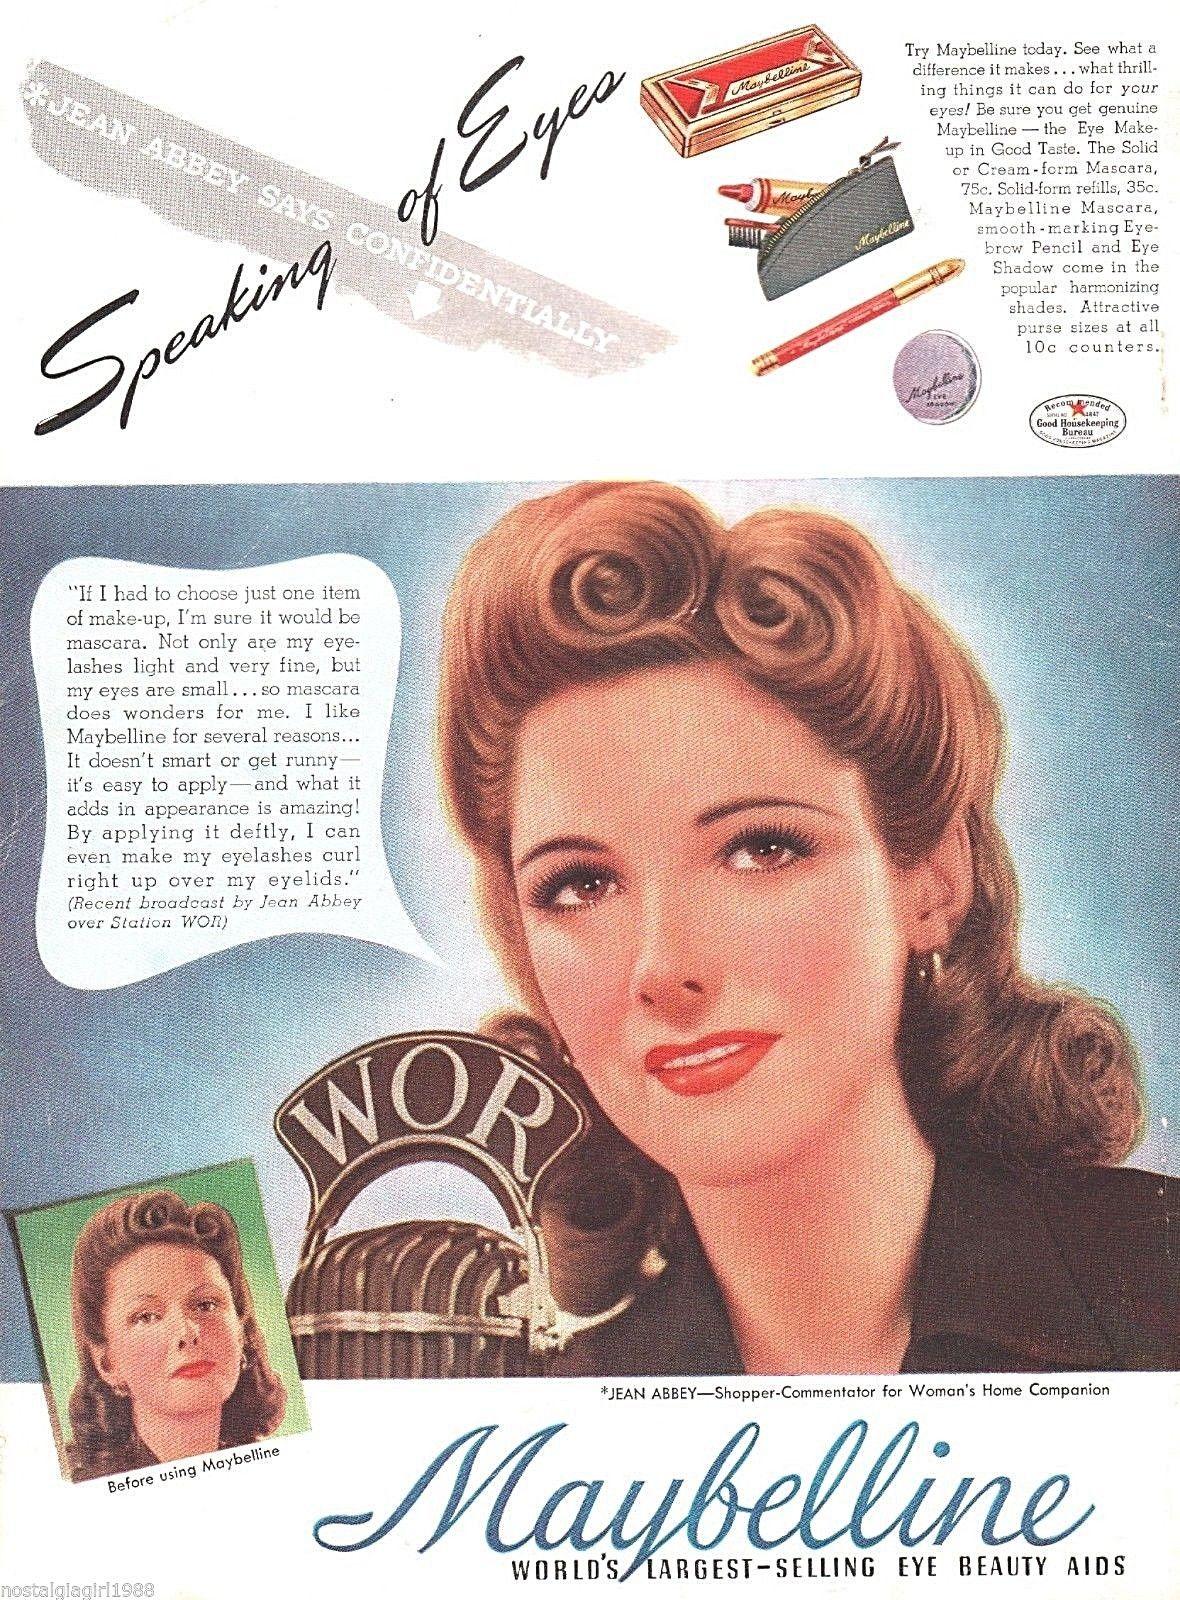 WOR 1941 ad